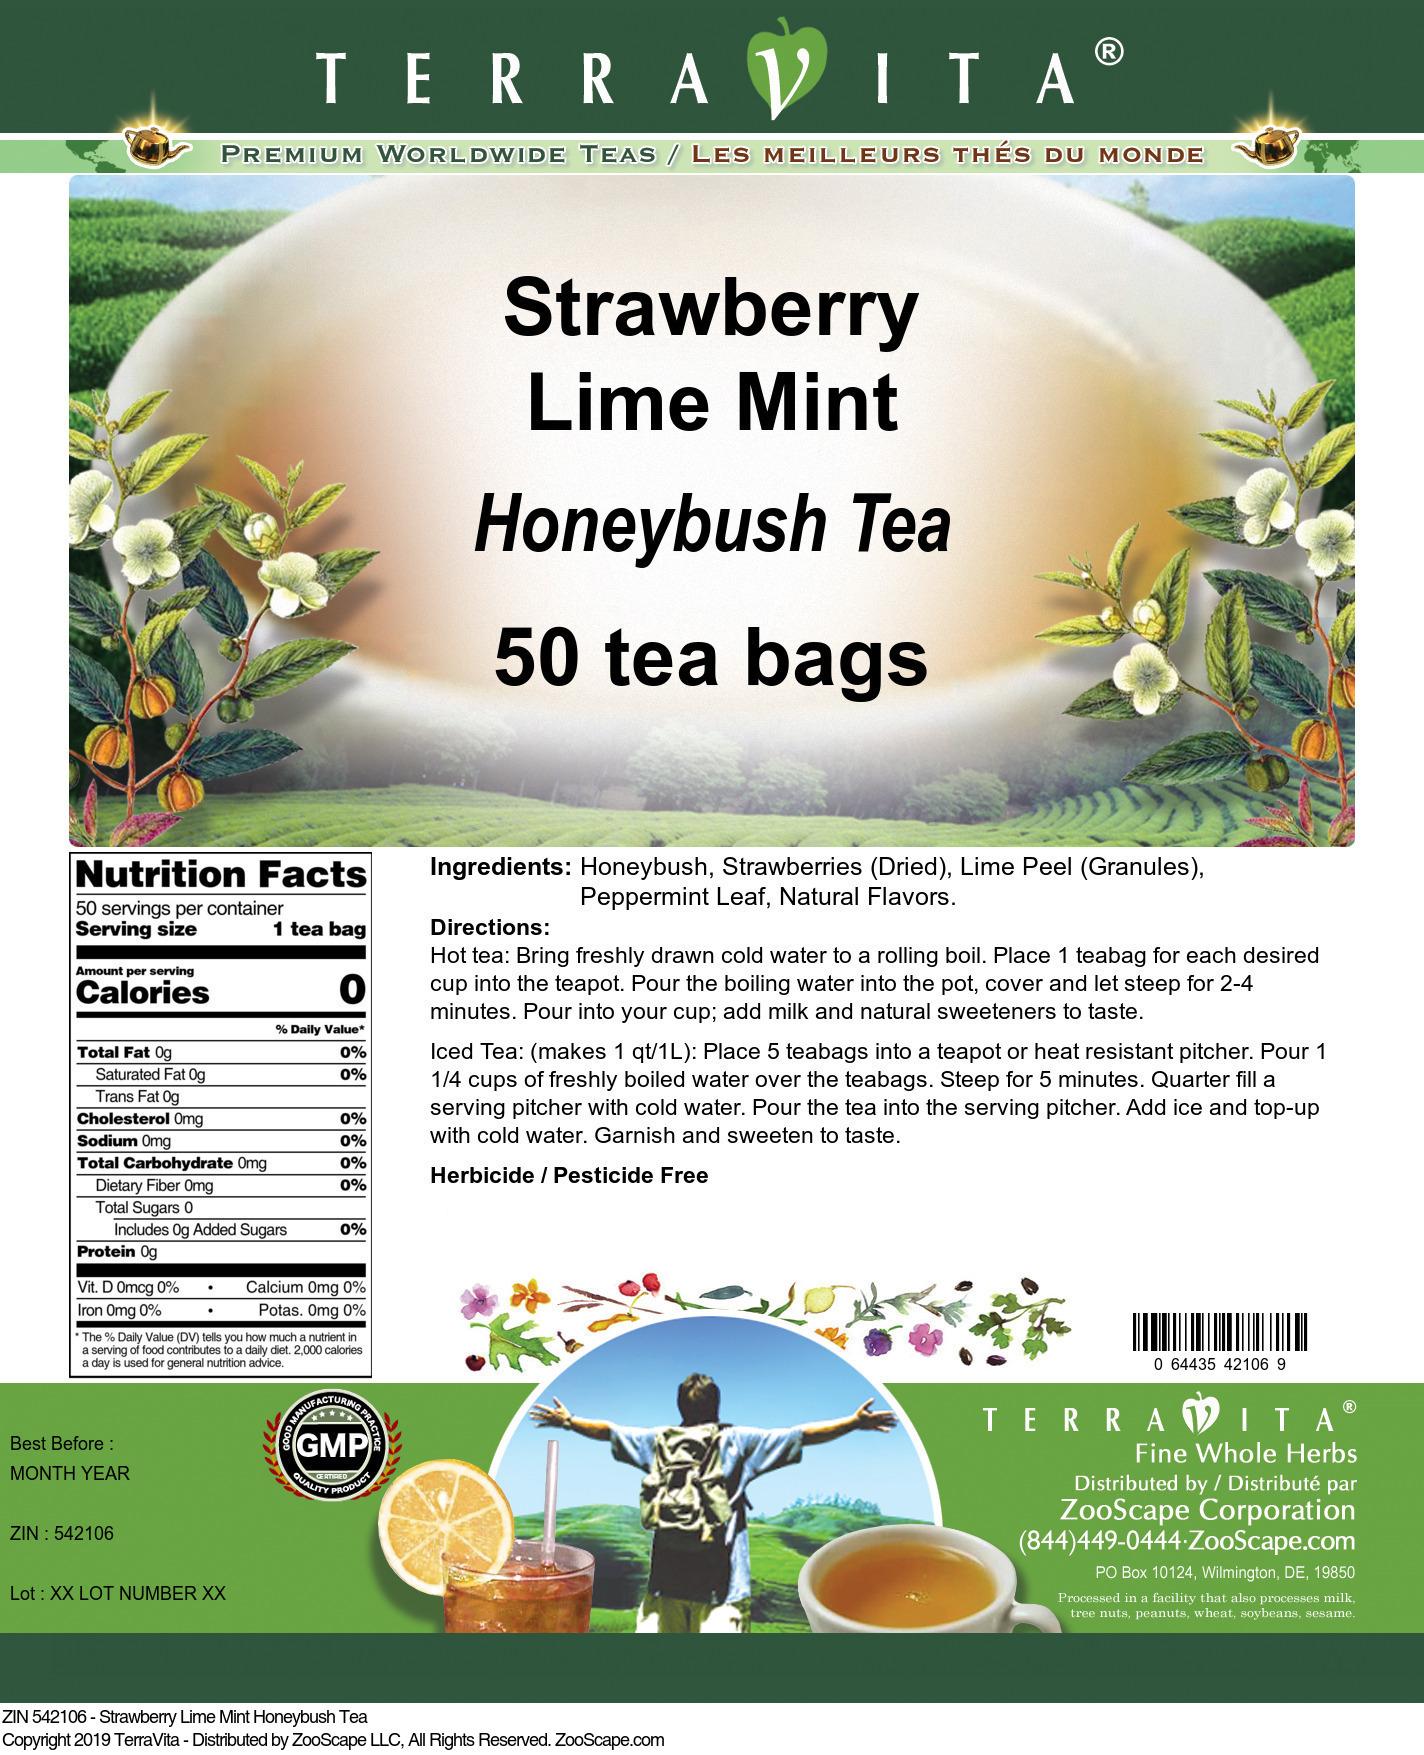 Strawberry Lime Mint Honeybush Tea